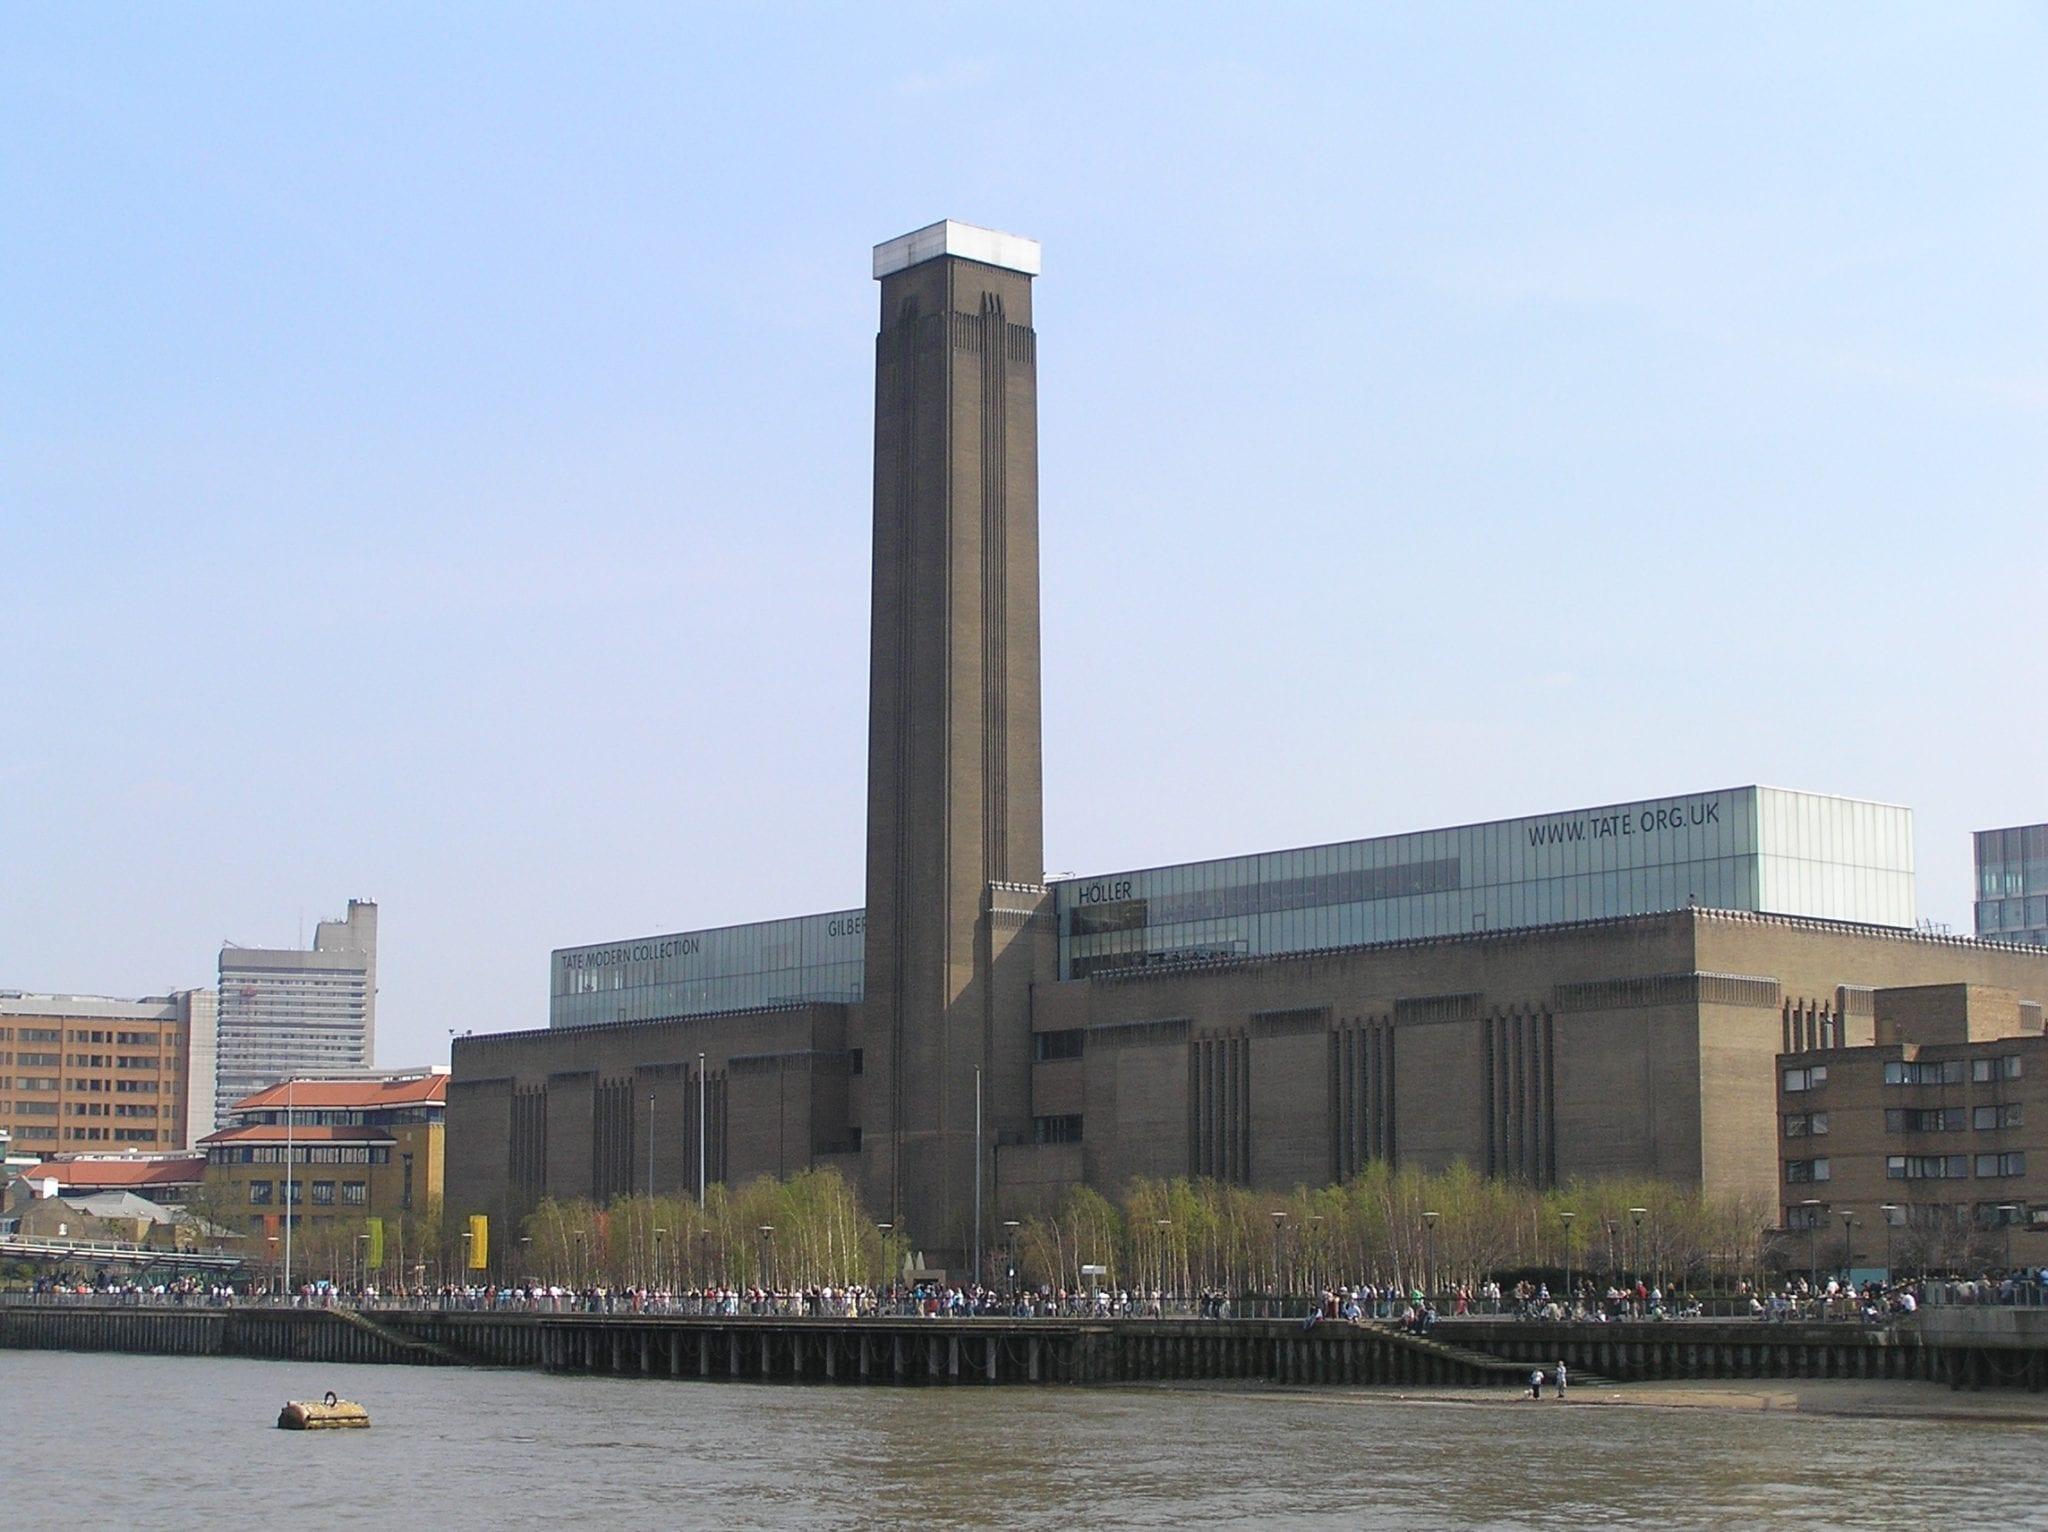 Museos de Londres Tate Modern de arte contemporáneo